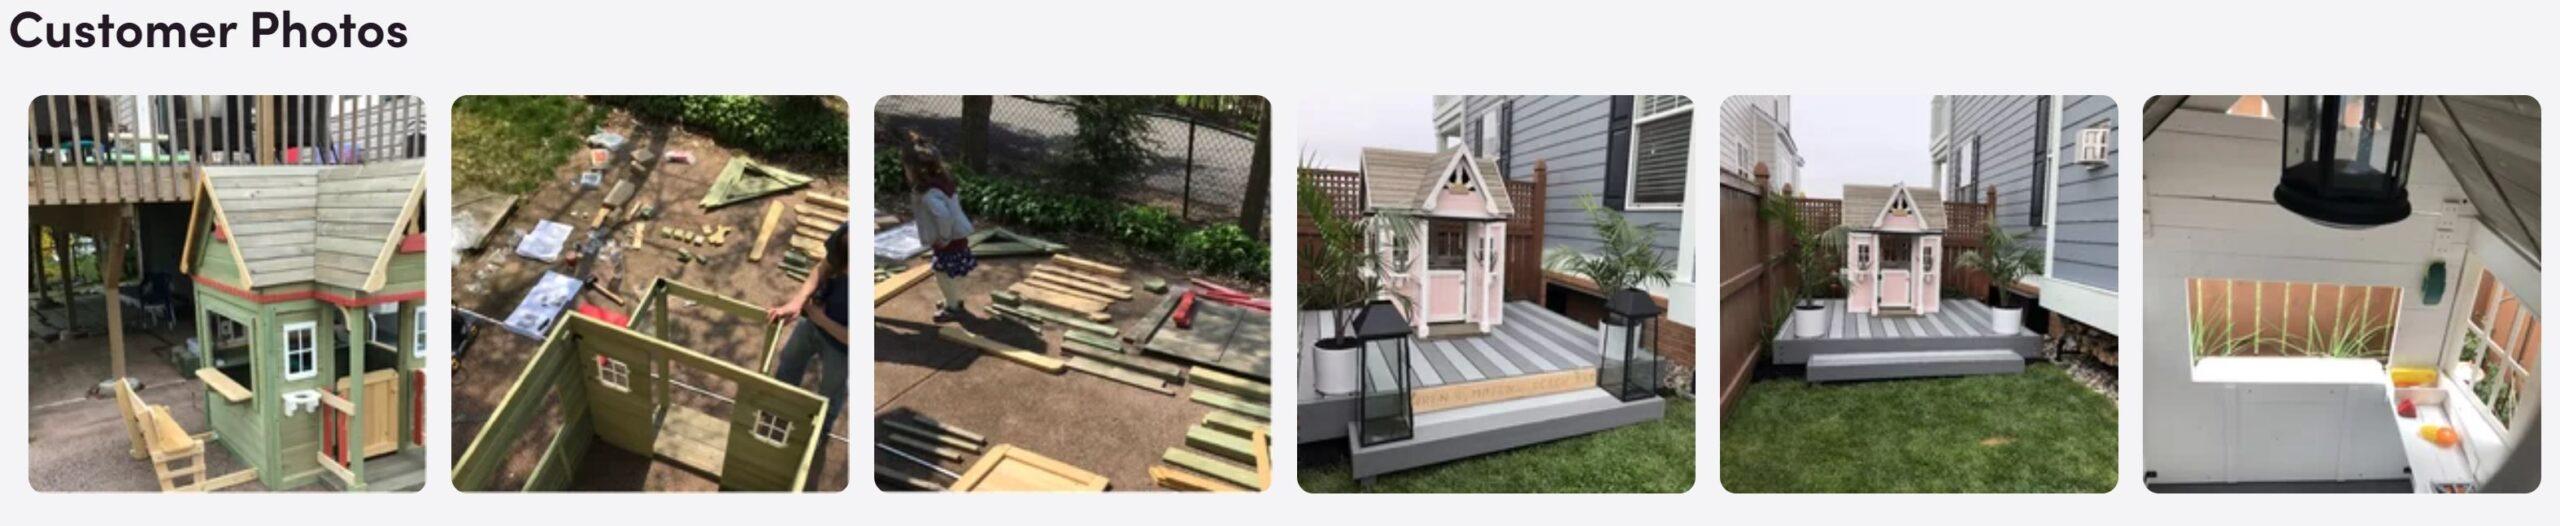 victorian outdoor kids playhouse